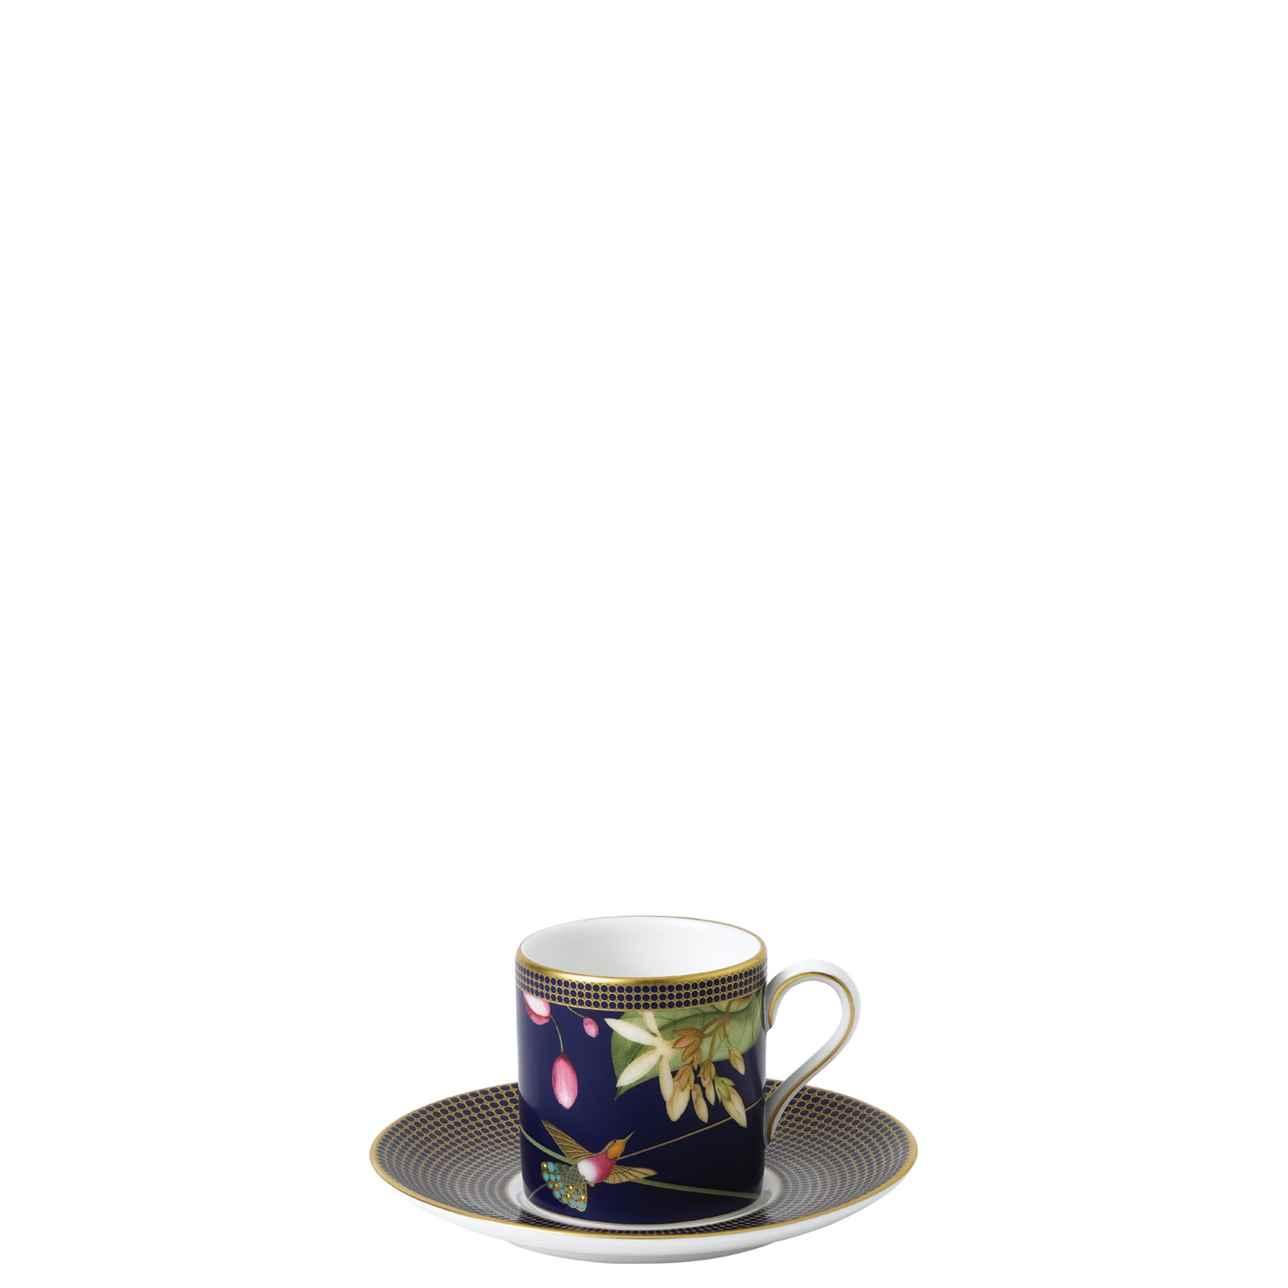 Hummingbird Espresso Cup and Saucer